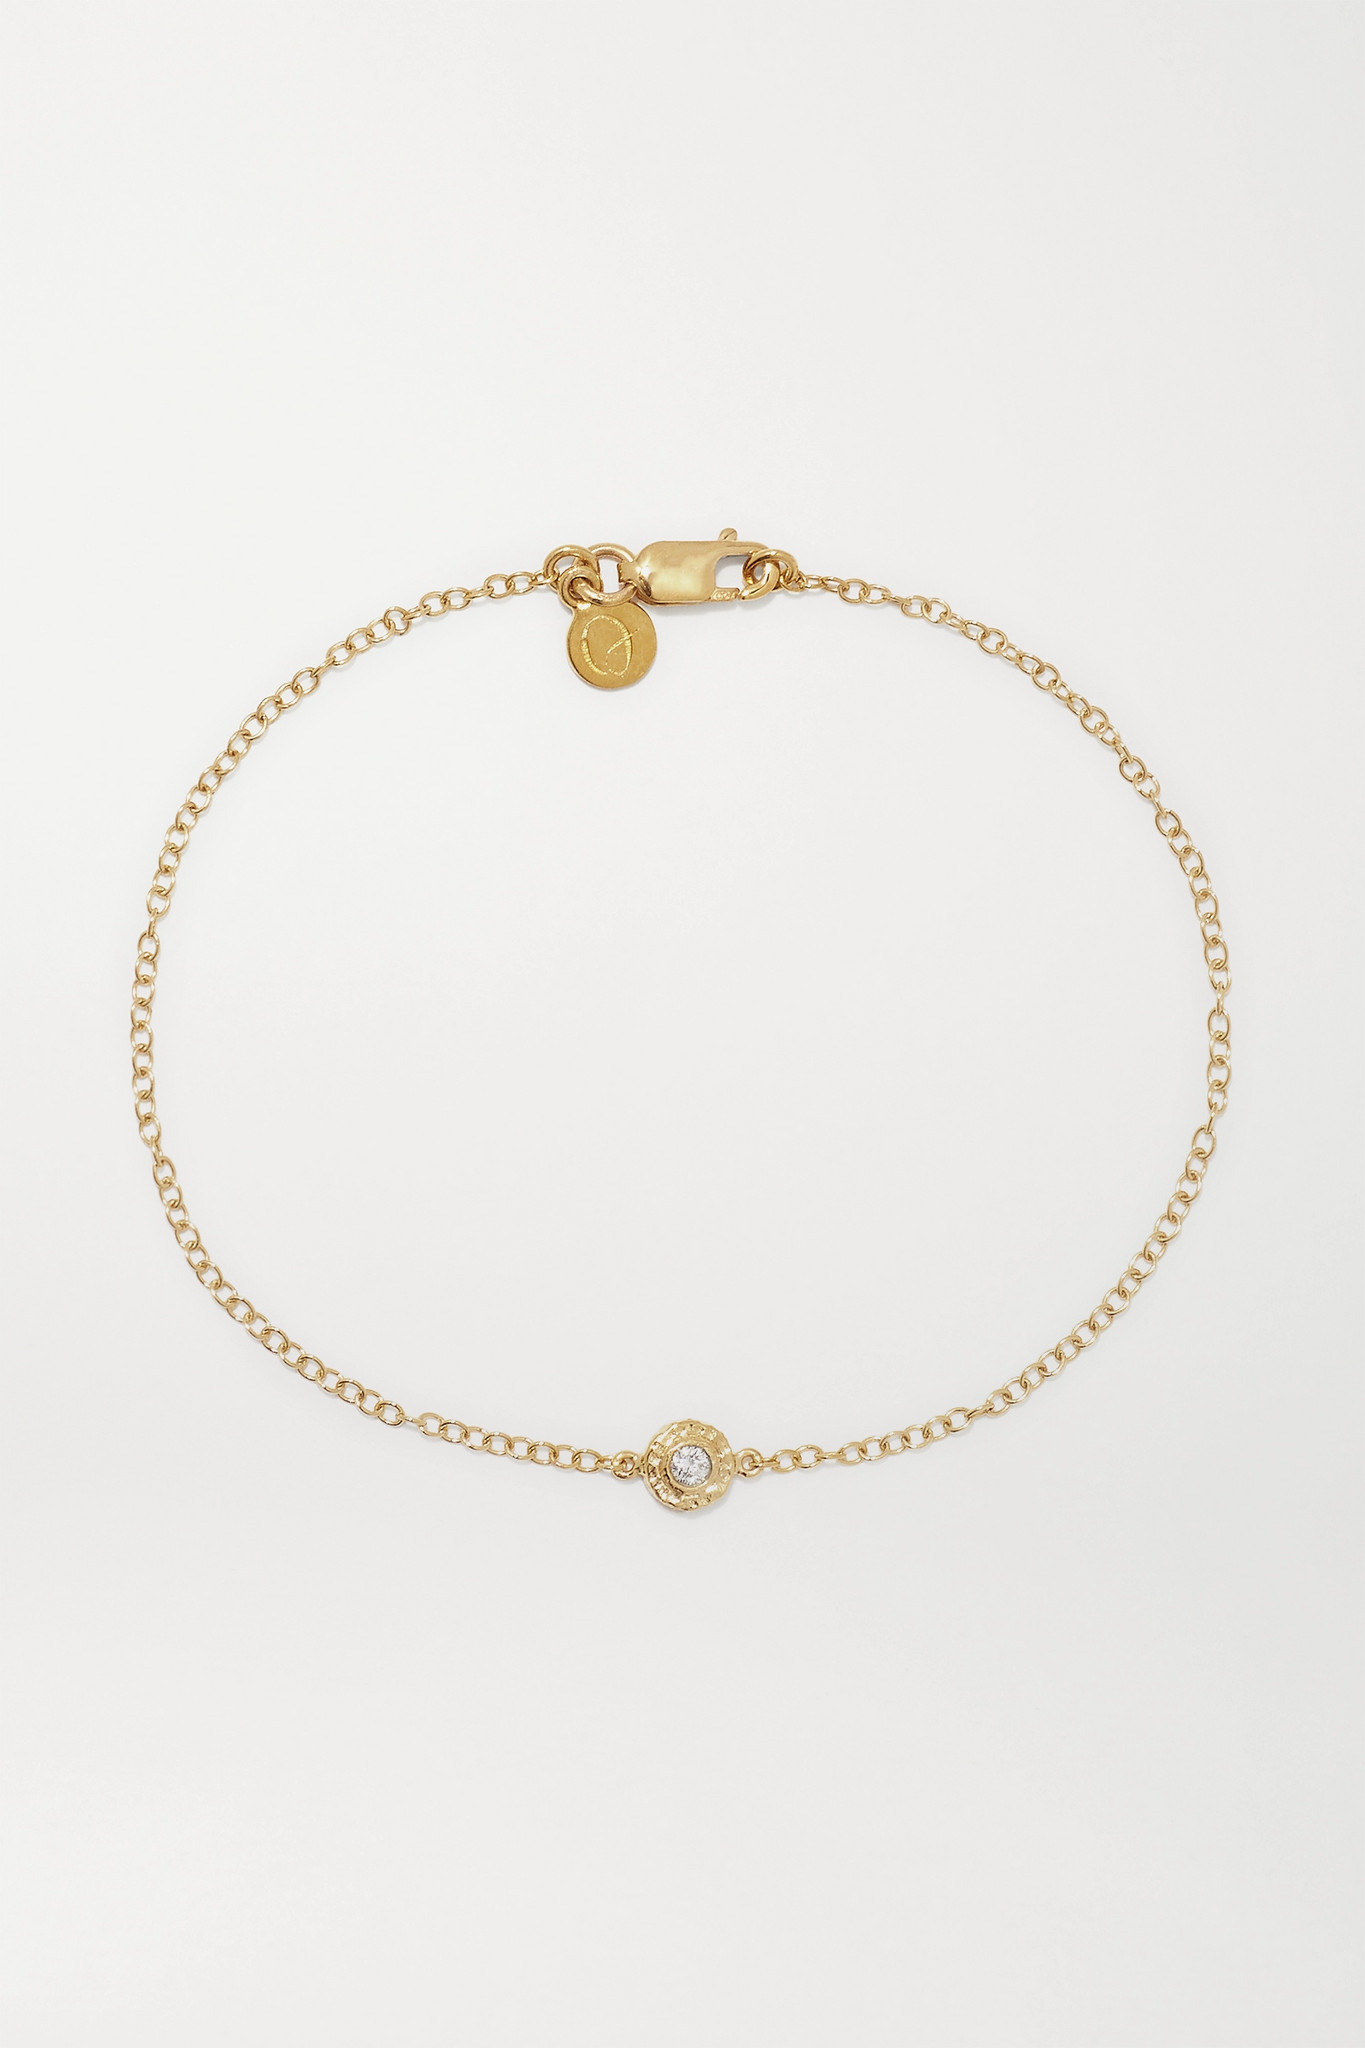 OCTAVIA ELIZABETH - 【net Sustain】nesting Gem 18k 回收黄金钻石手链 - 金色 - one size